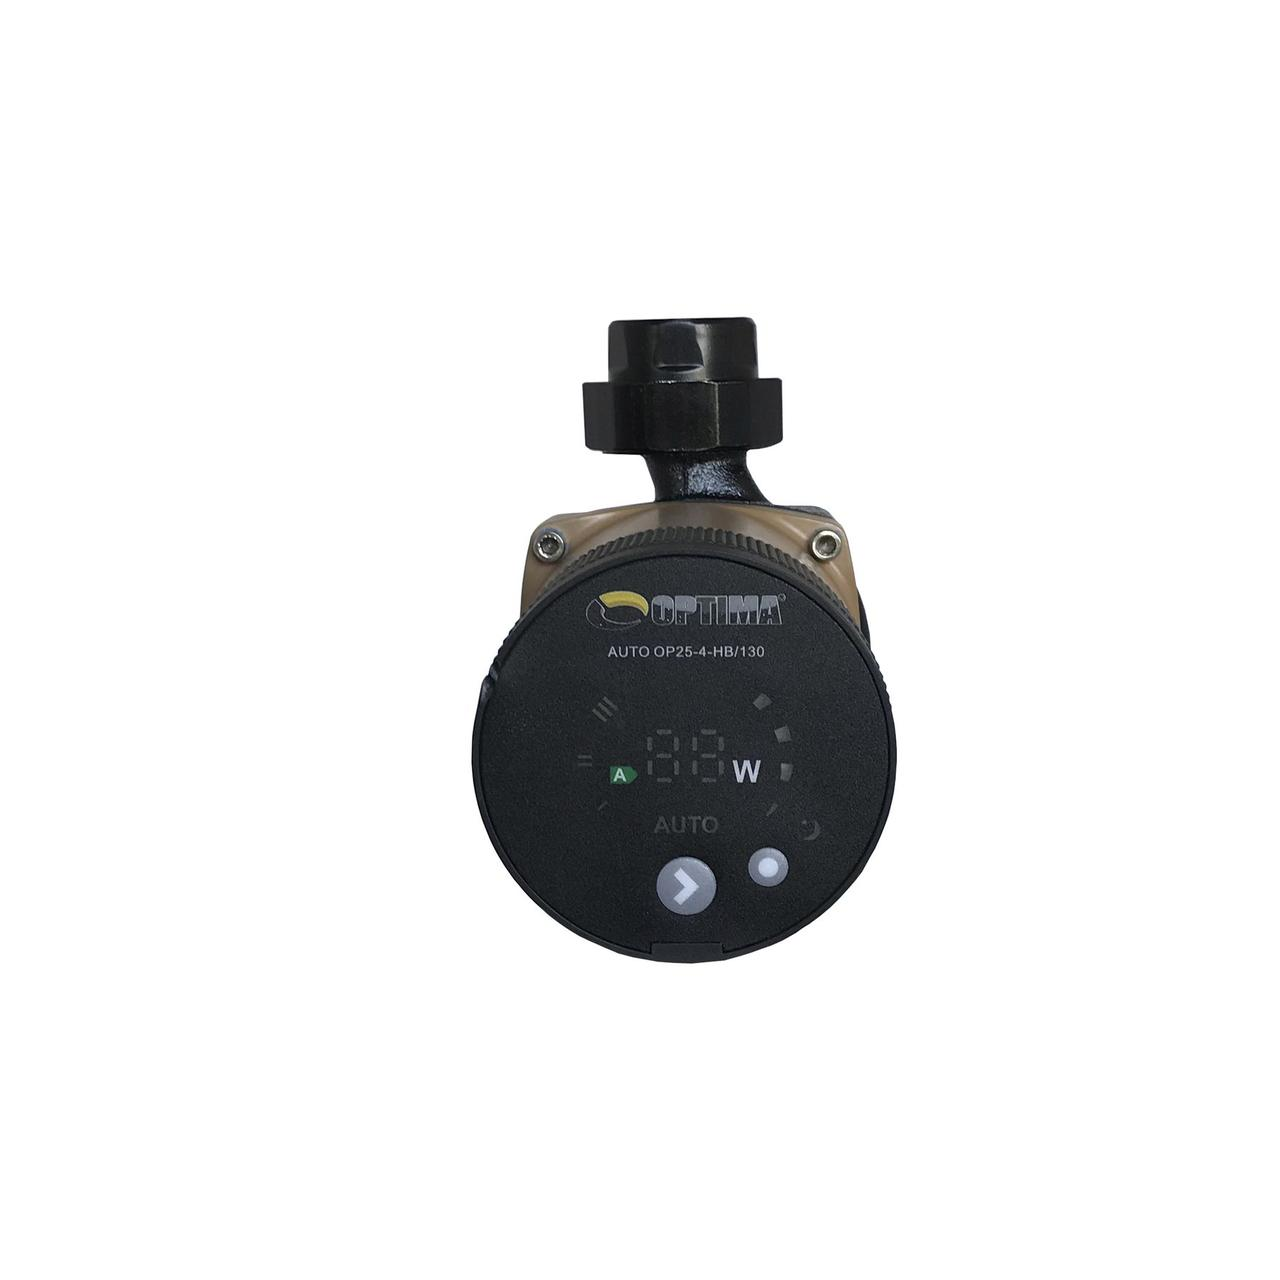 Насос циркуляционный энергосберегающий Optima OP25-40AUTO 130 мм + гайки